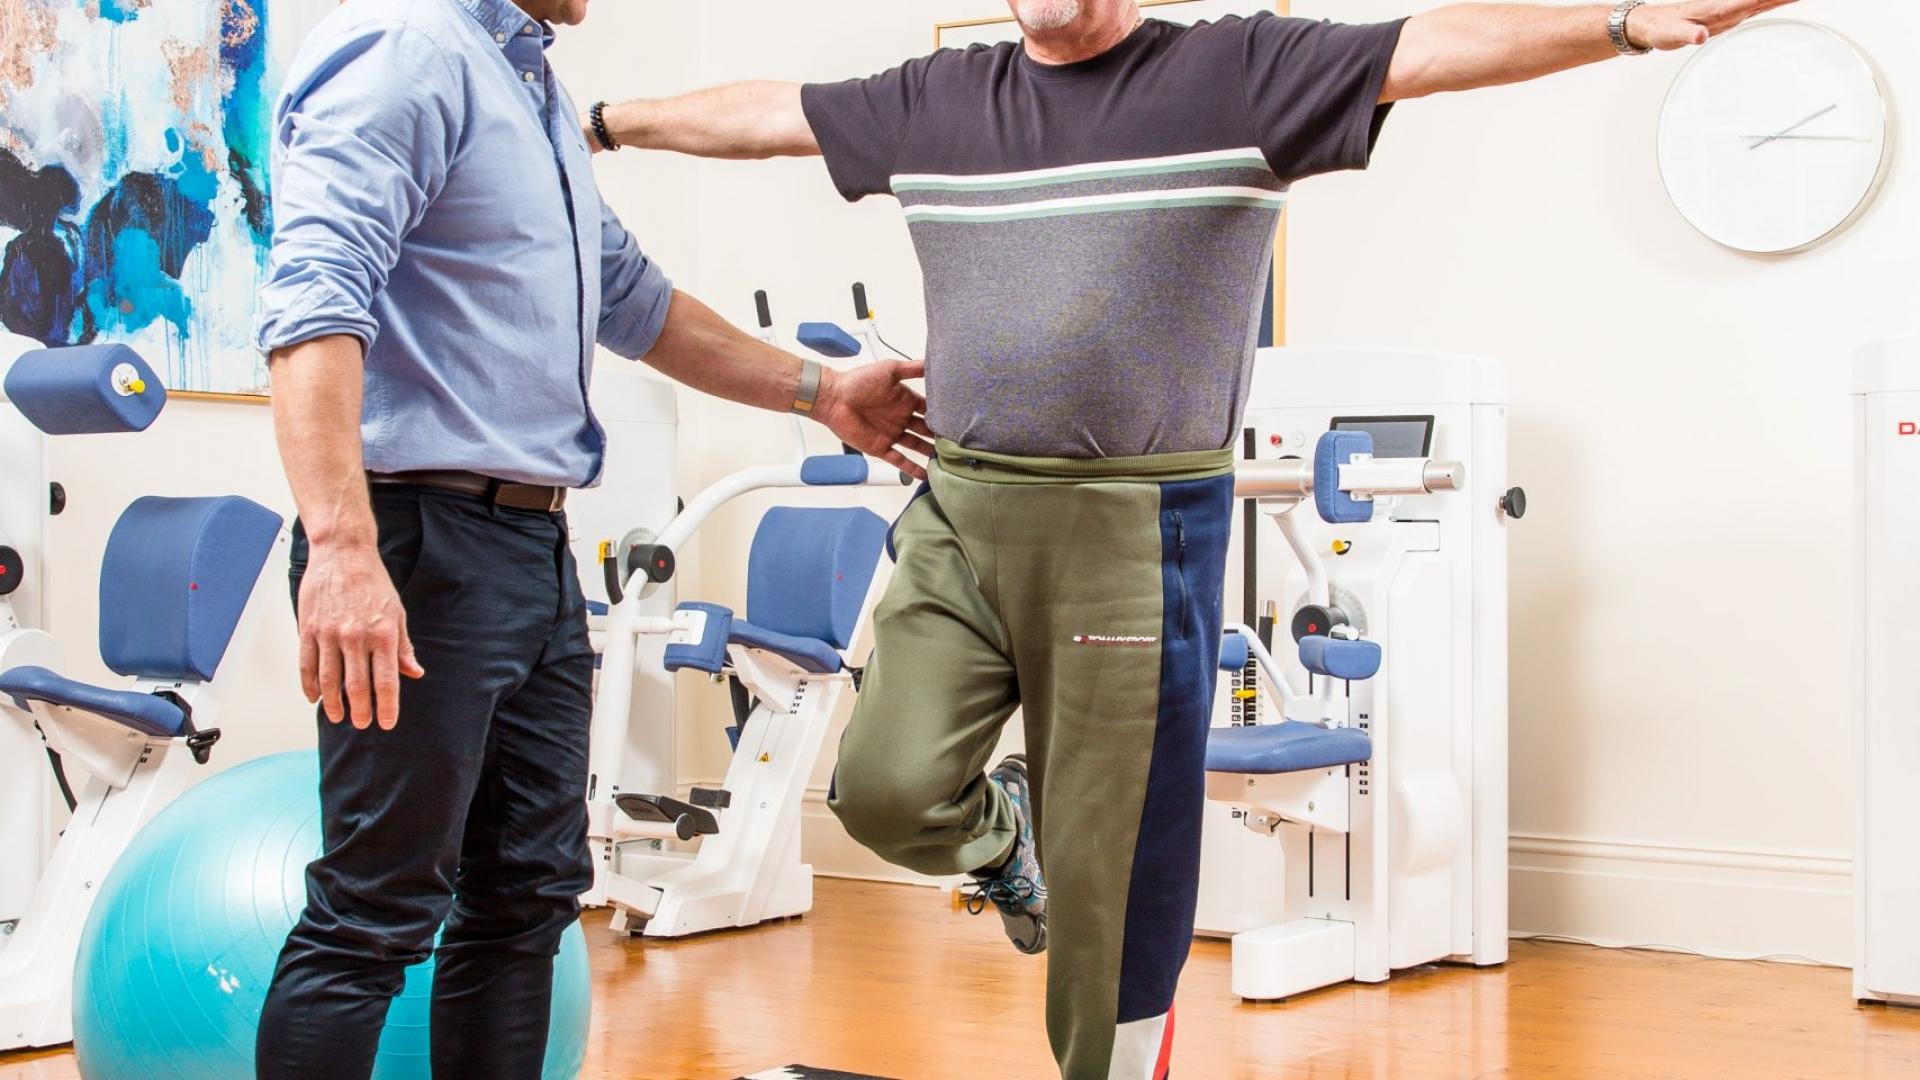 Workstrong_Physiotherapy_2020_credit_Mark_Gambino-5770